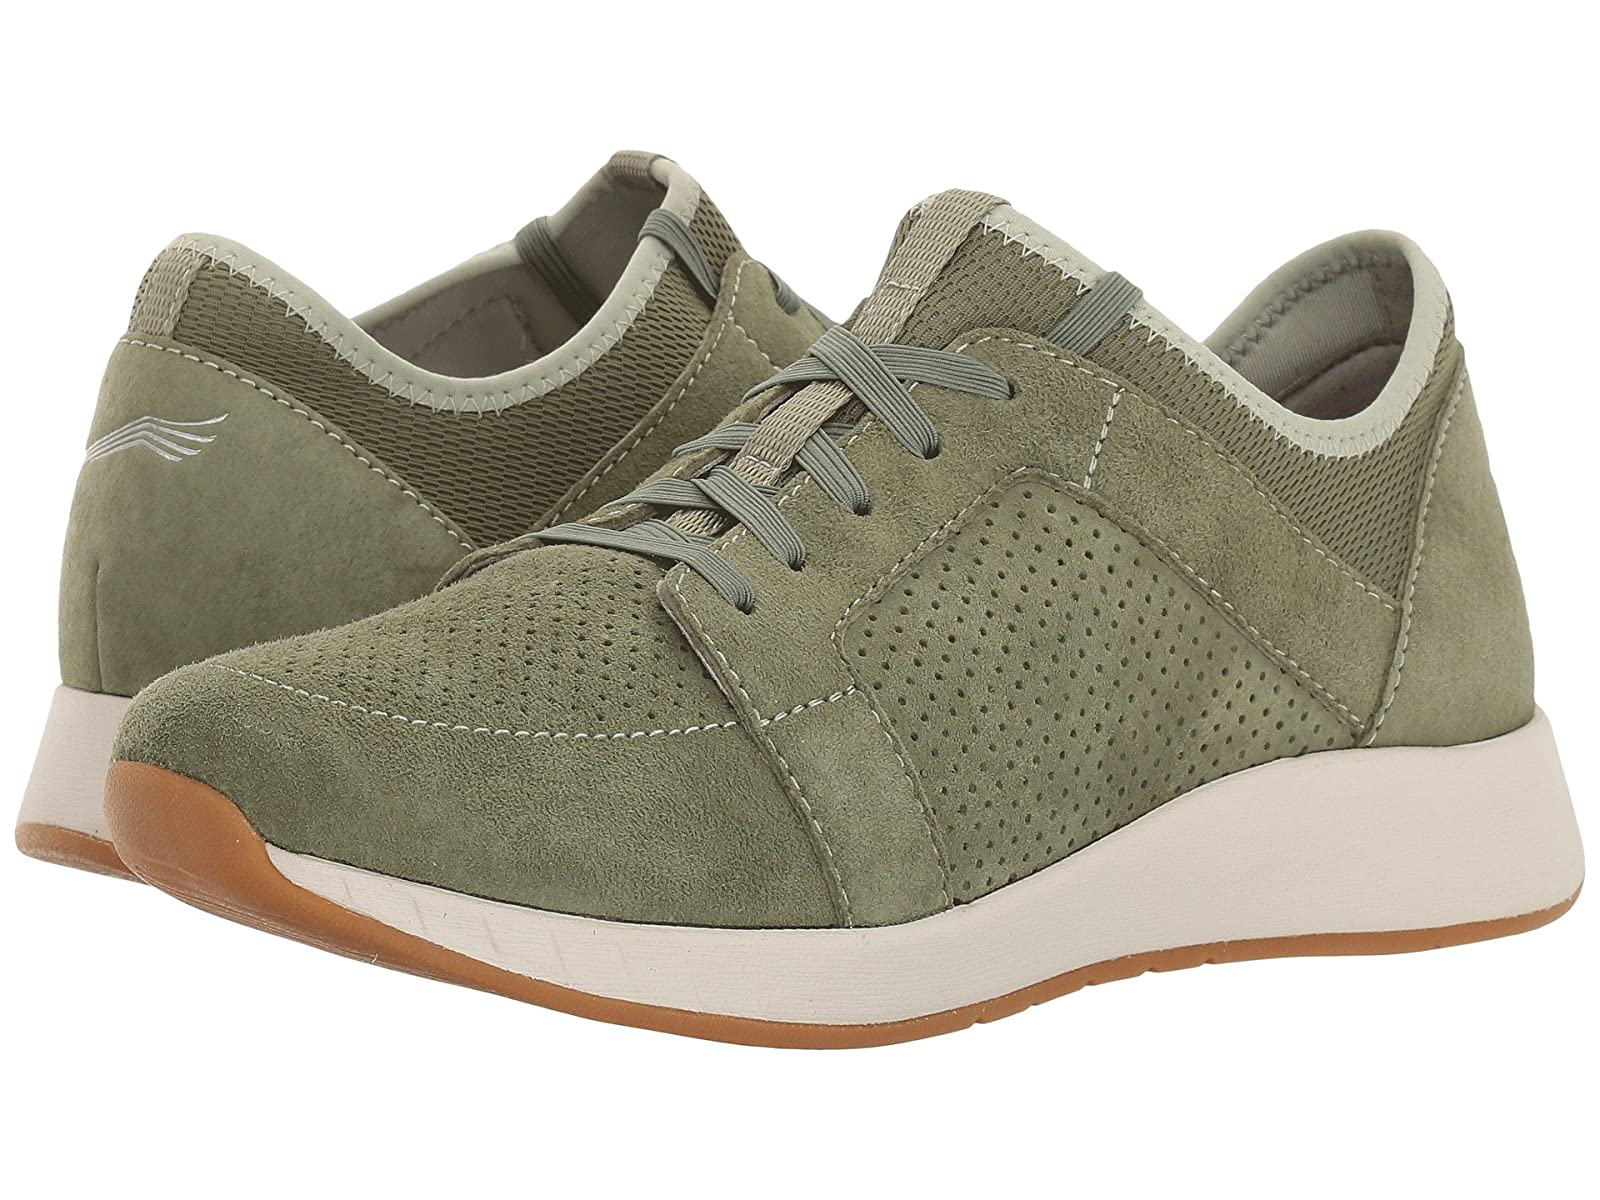 Dansko CozetteCheap and distinctive eye-catching shoes